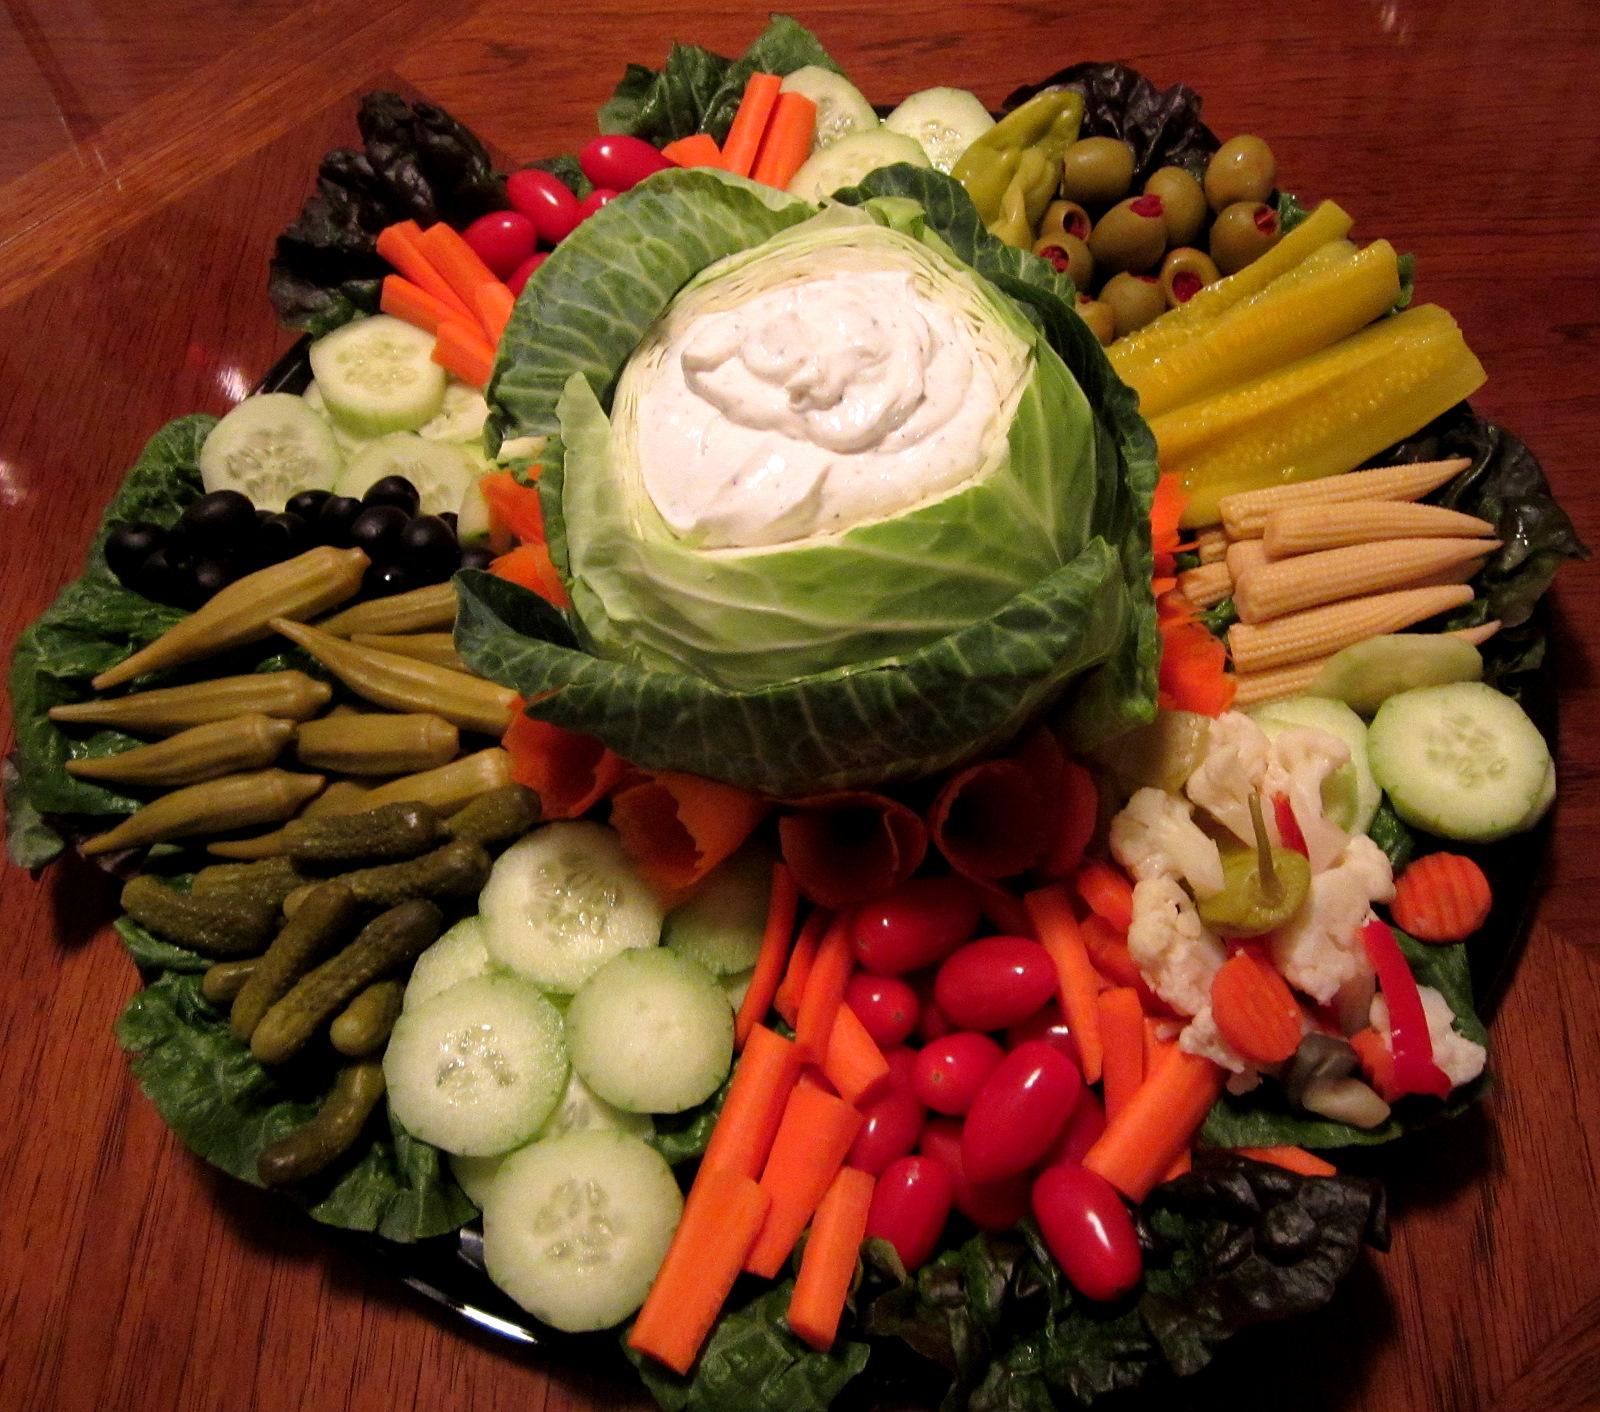 funeral food | doskogirl